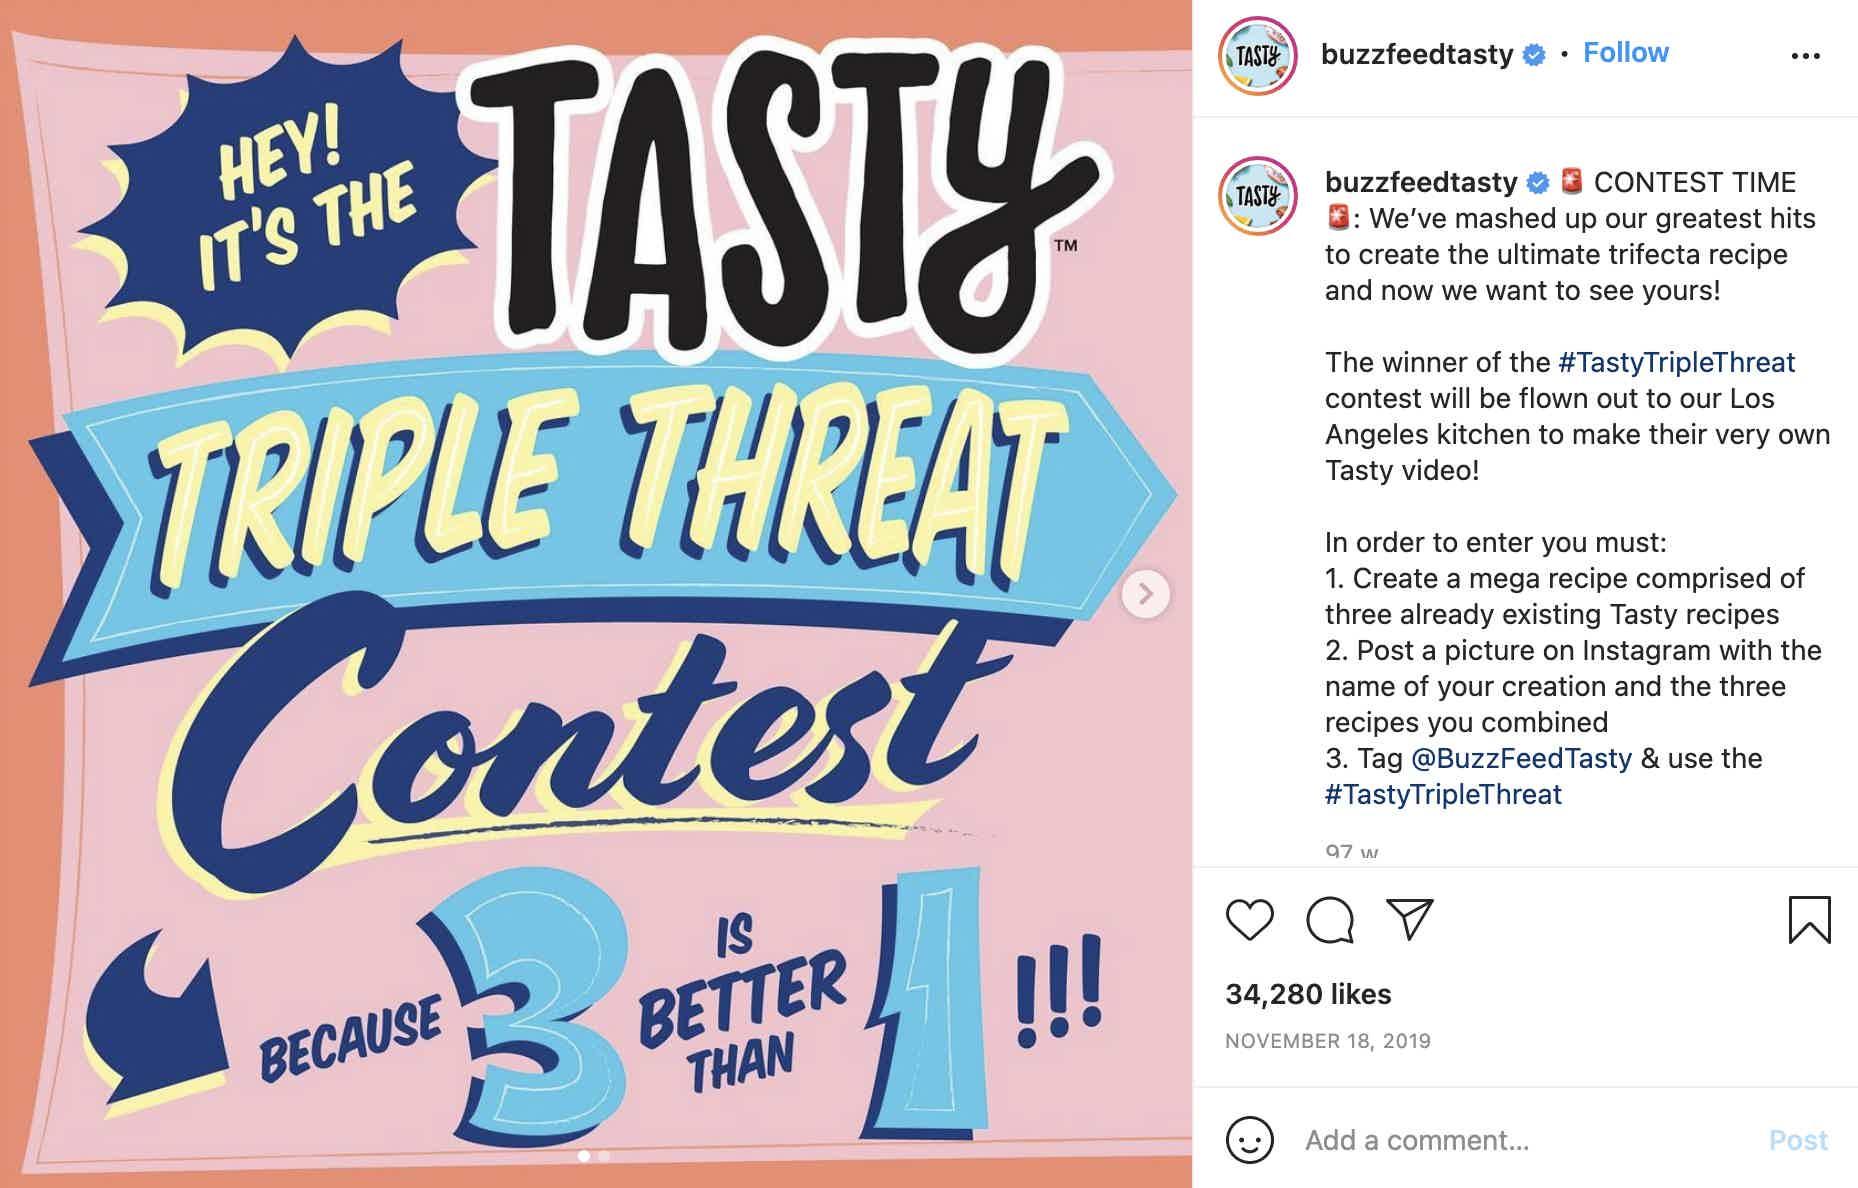 Bussfeed Tasty Contest